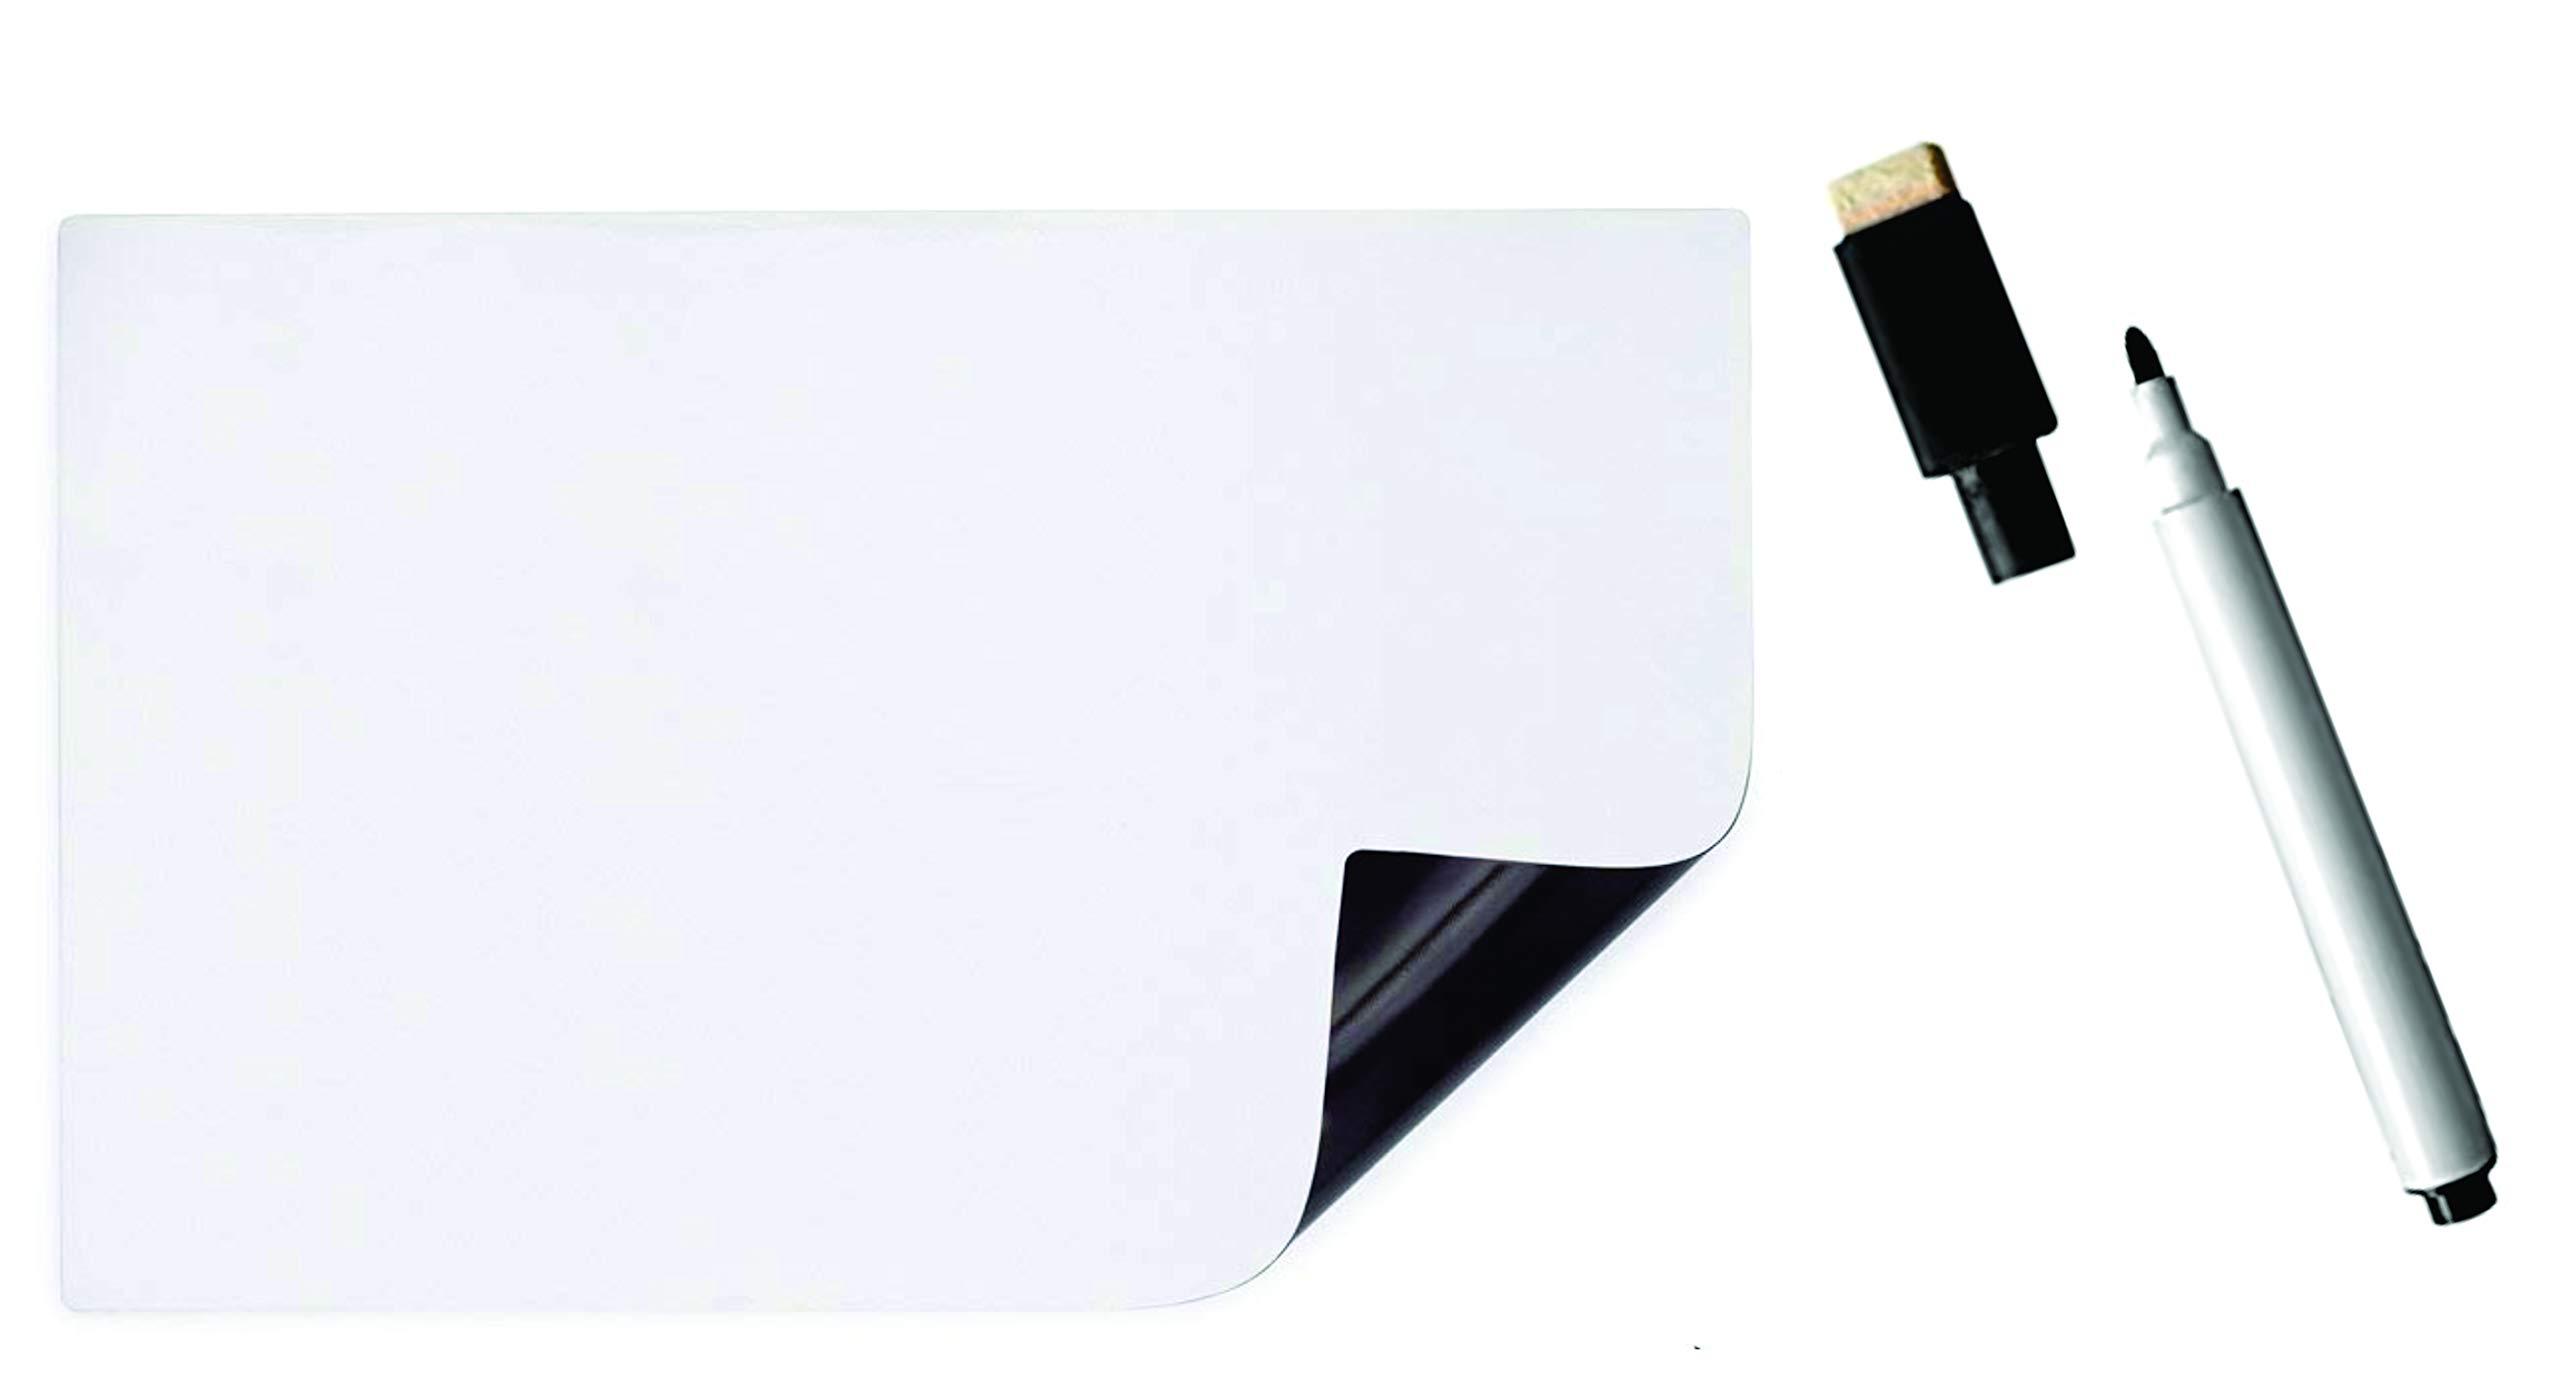 IMPRINT'S Set of Fridge Magnet Sheet Soft Magnetic Sheet and Eraser Cum Marker, Kitchen/Home Whiteboard 7'' x 5'', Magnetic Dry Erase Board Sticker on Iron Metal Surface